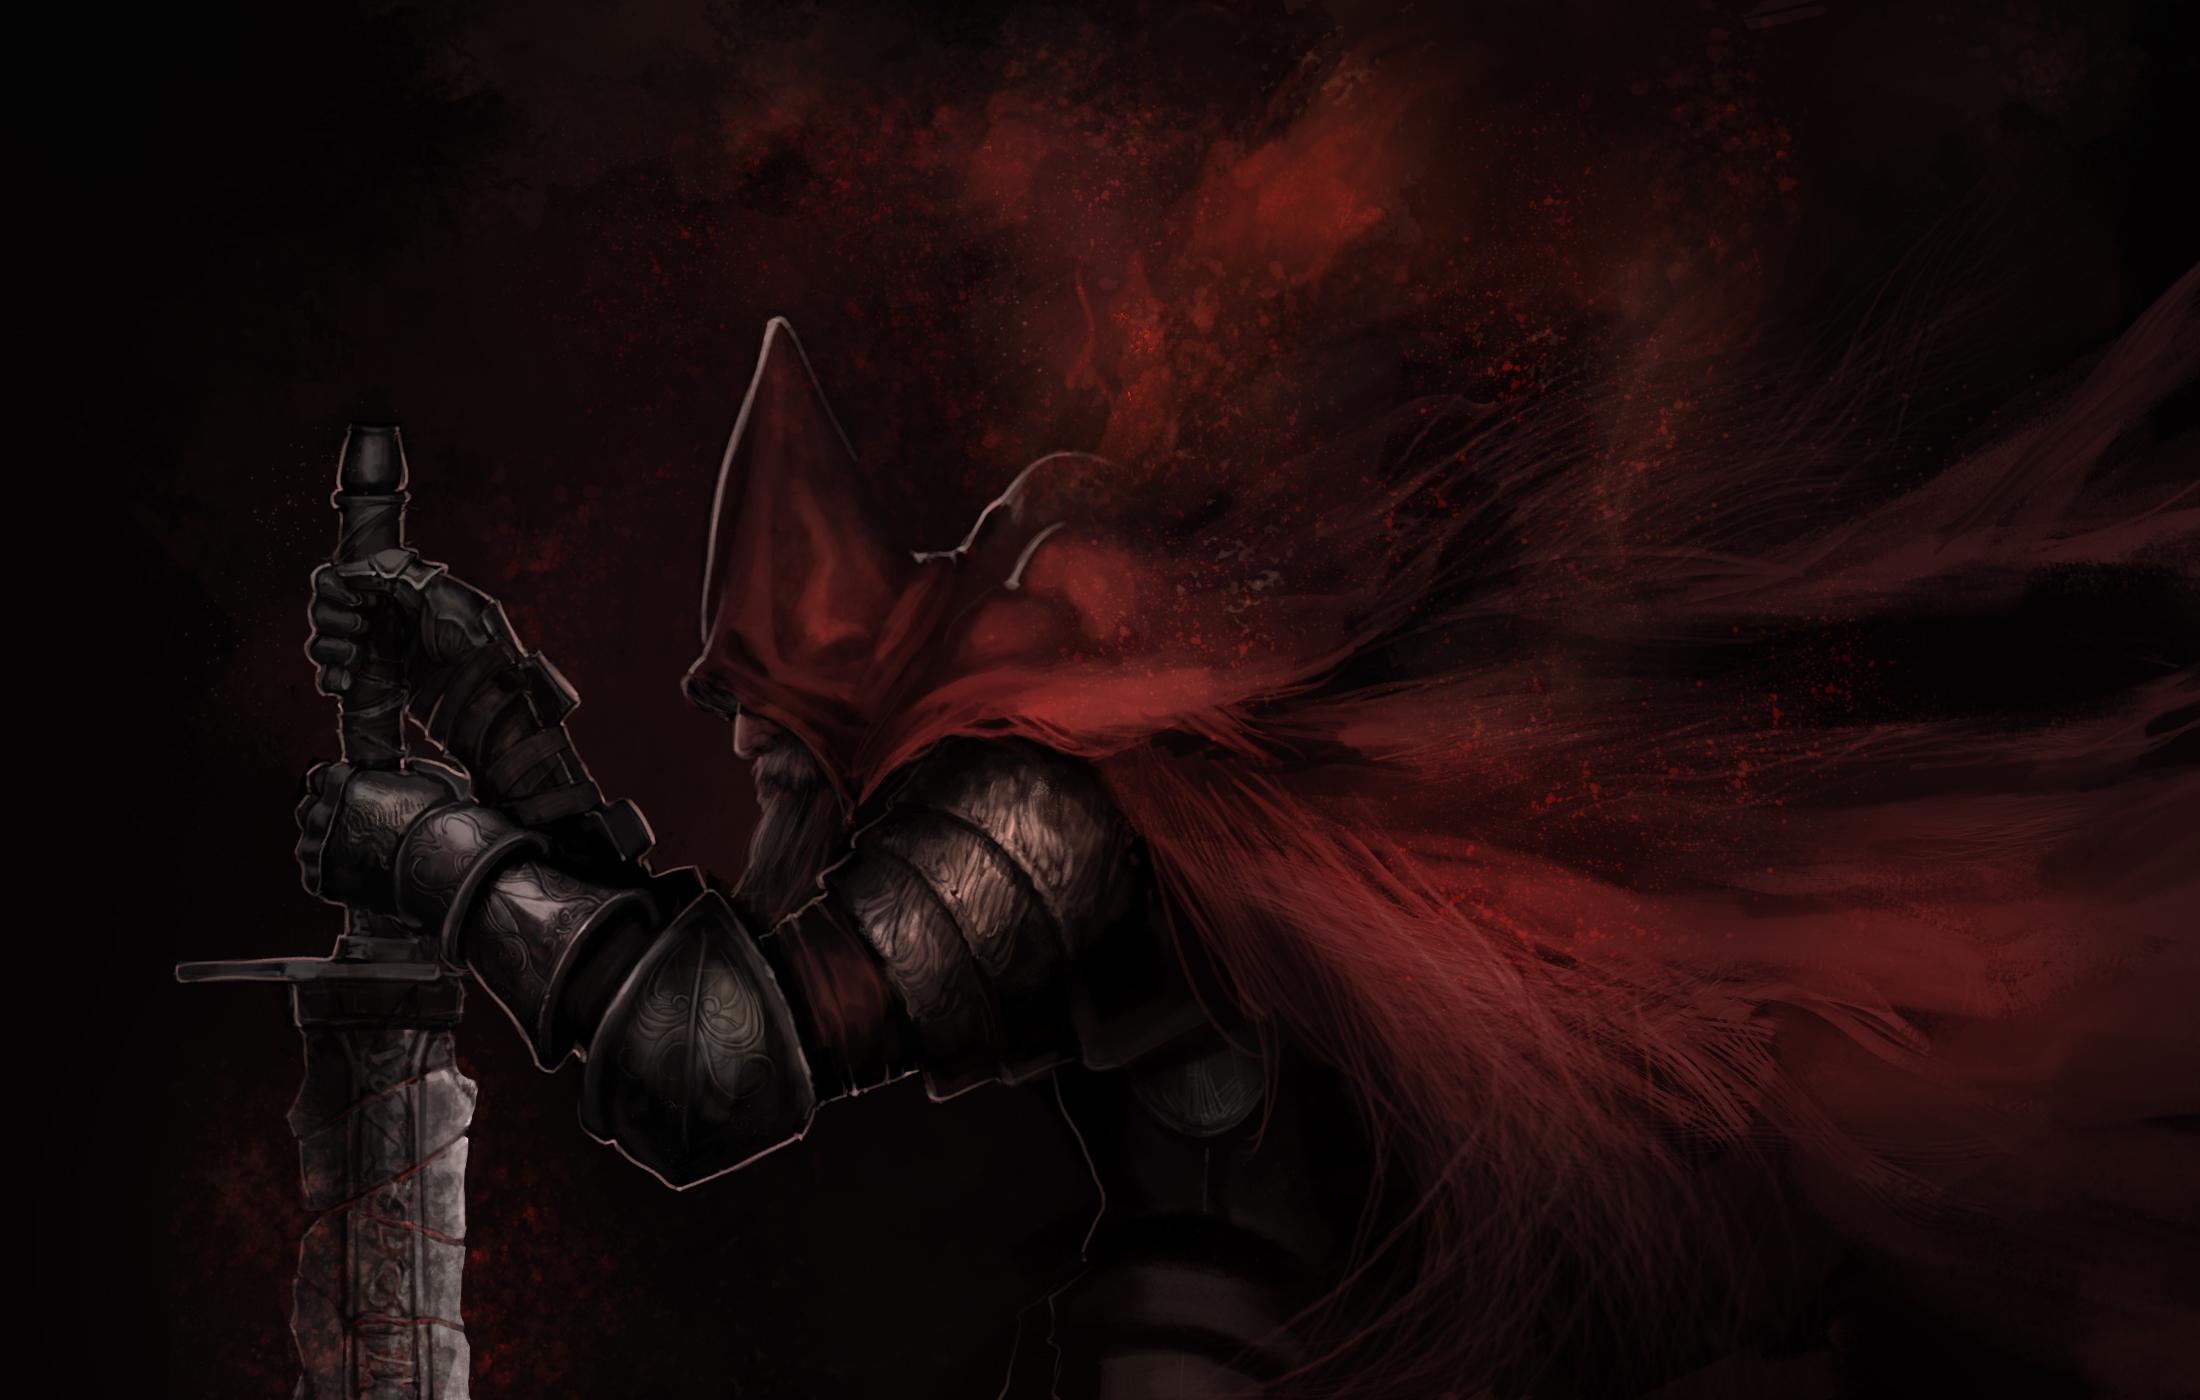 Dark Souls Iii Hd Wallpaper Background Image 2200x1400 Id